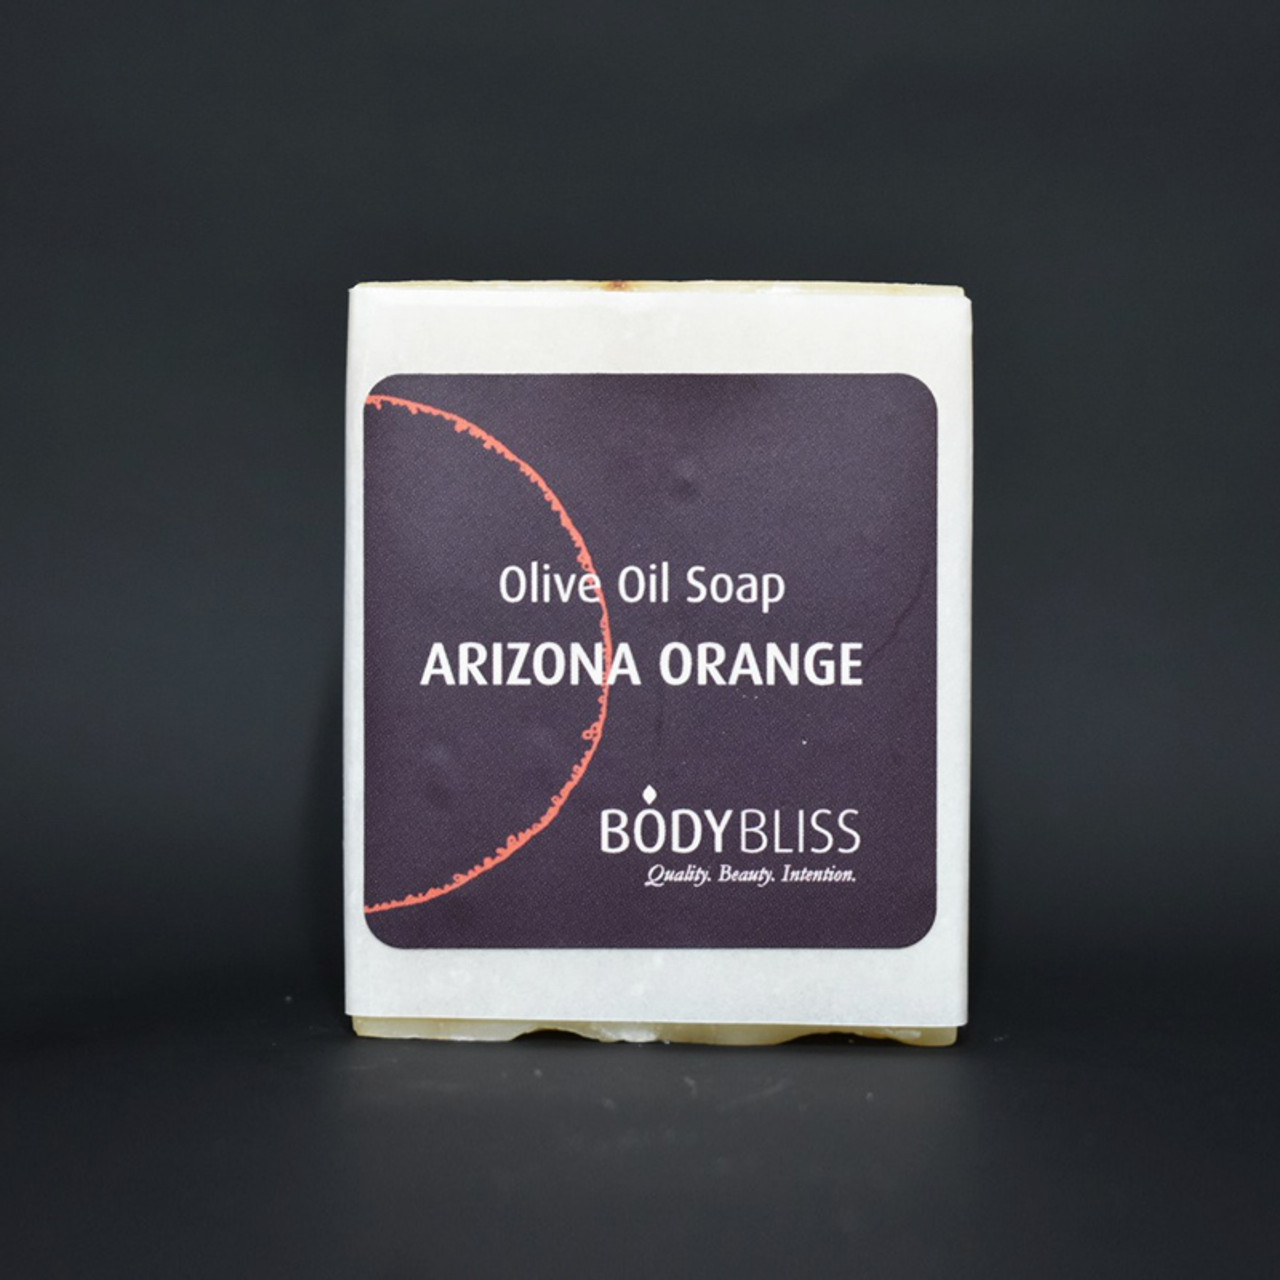 Arizona Orange Olive Oil Soap